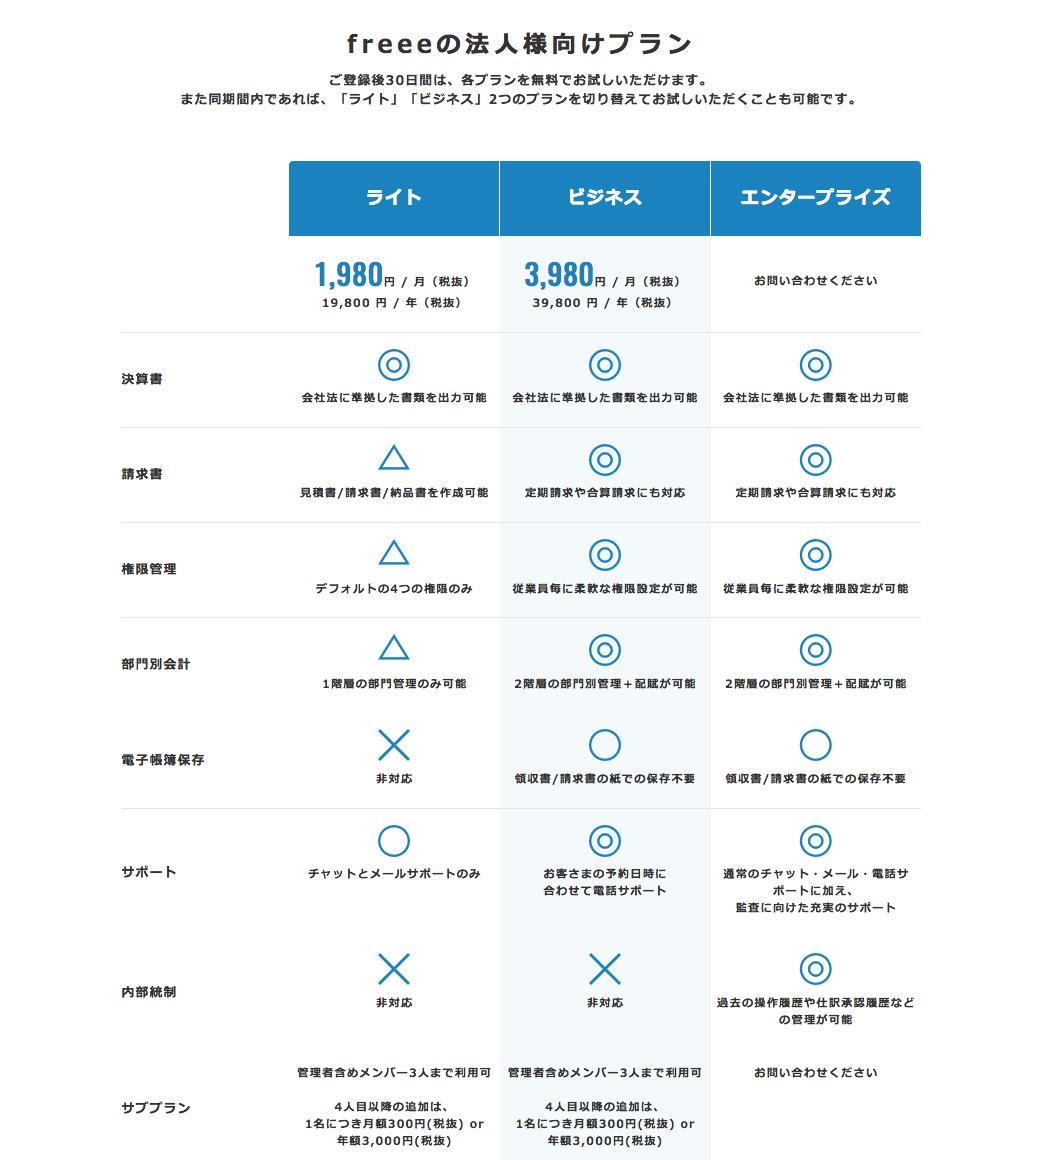 freee(フリー)クラウド会計サービス法人料金プラン